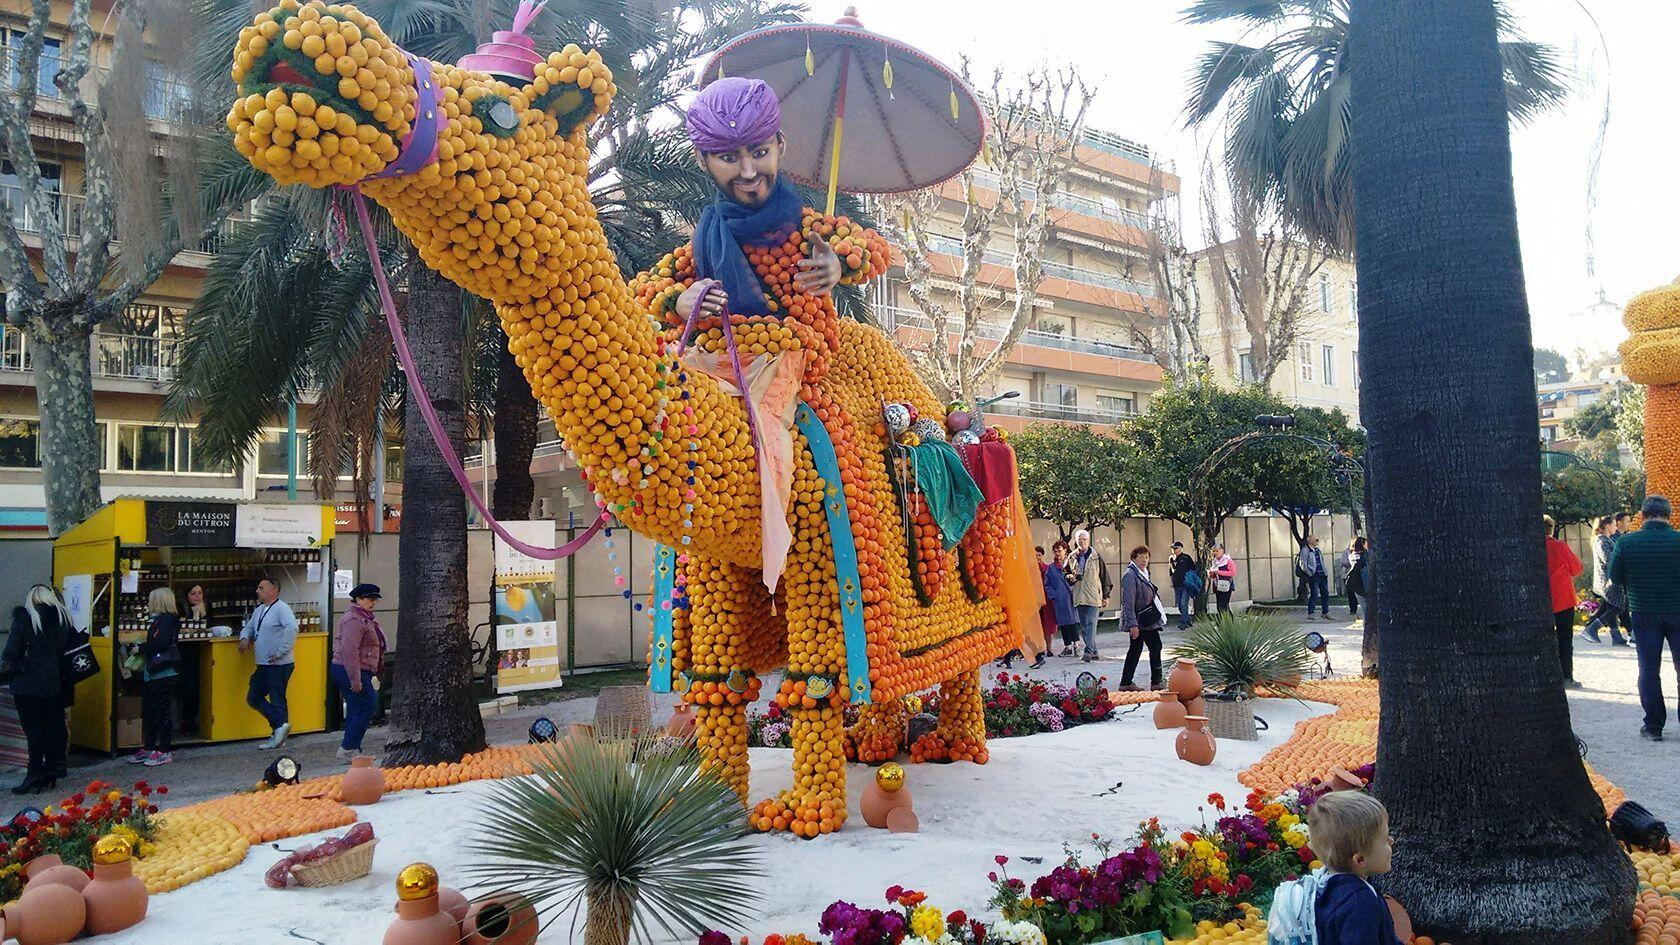 French Riviera Visit Menton Citrus Festival